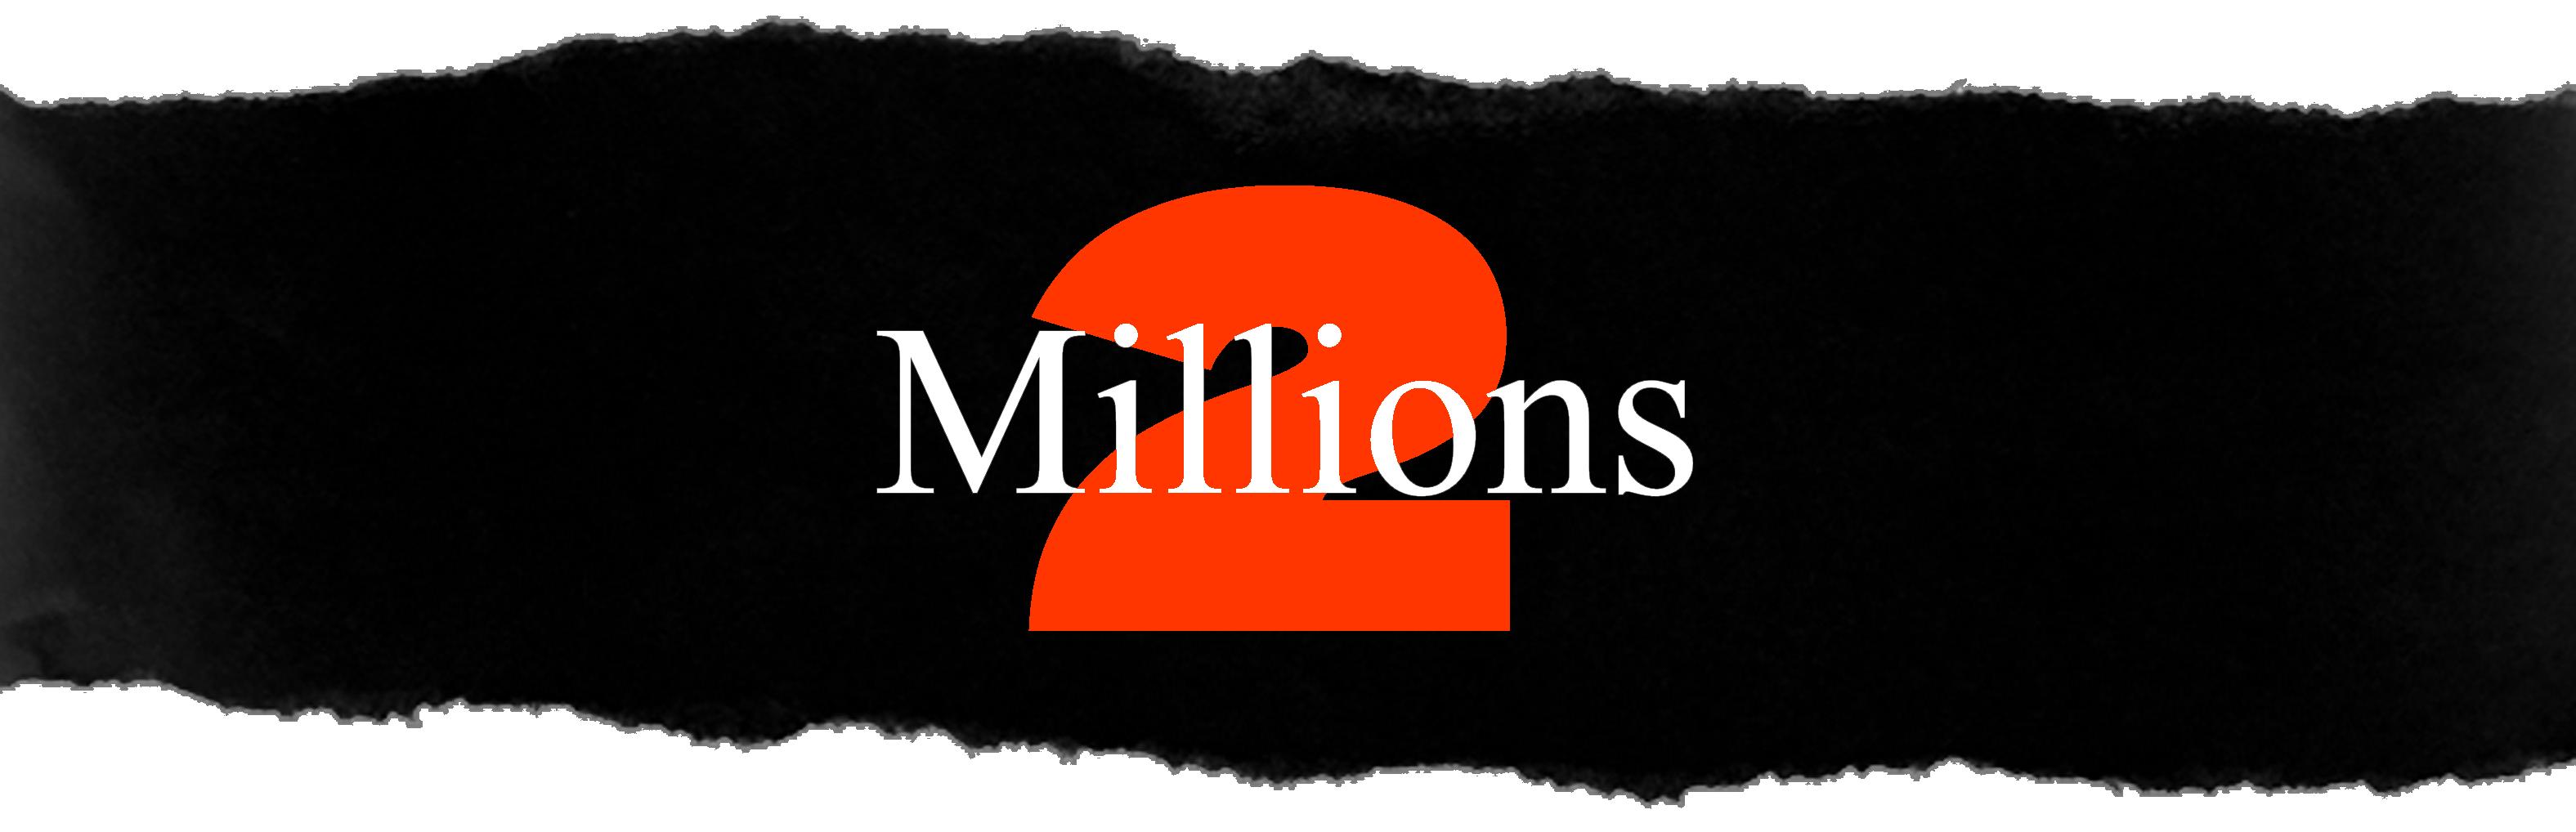 millions222